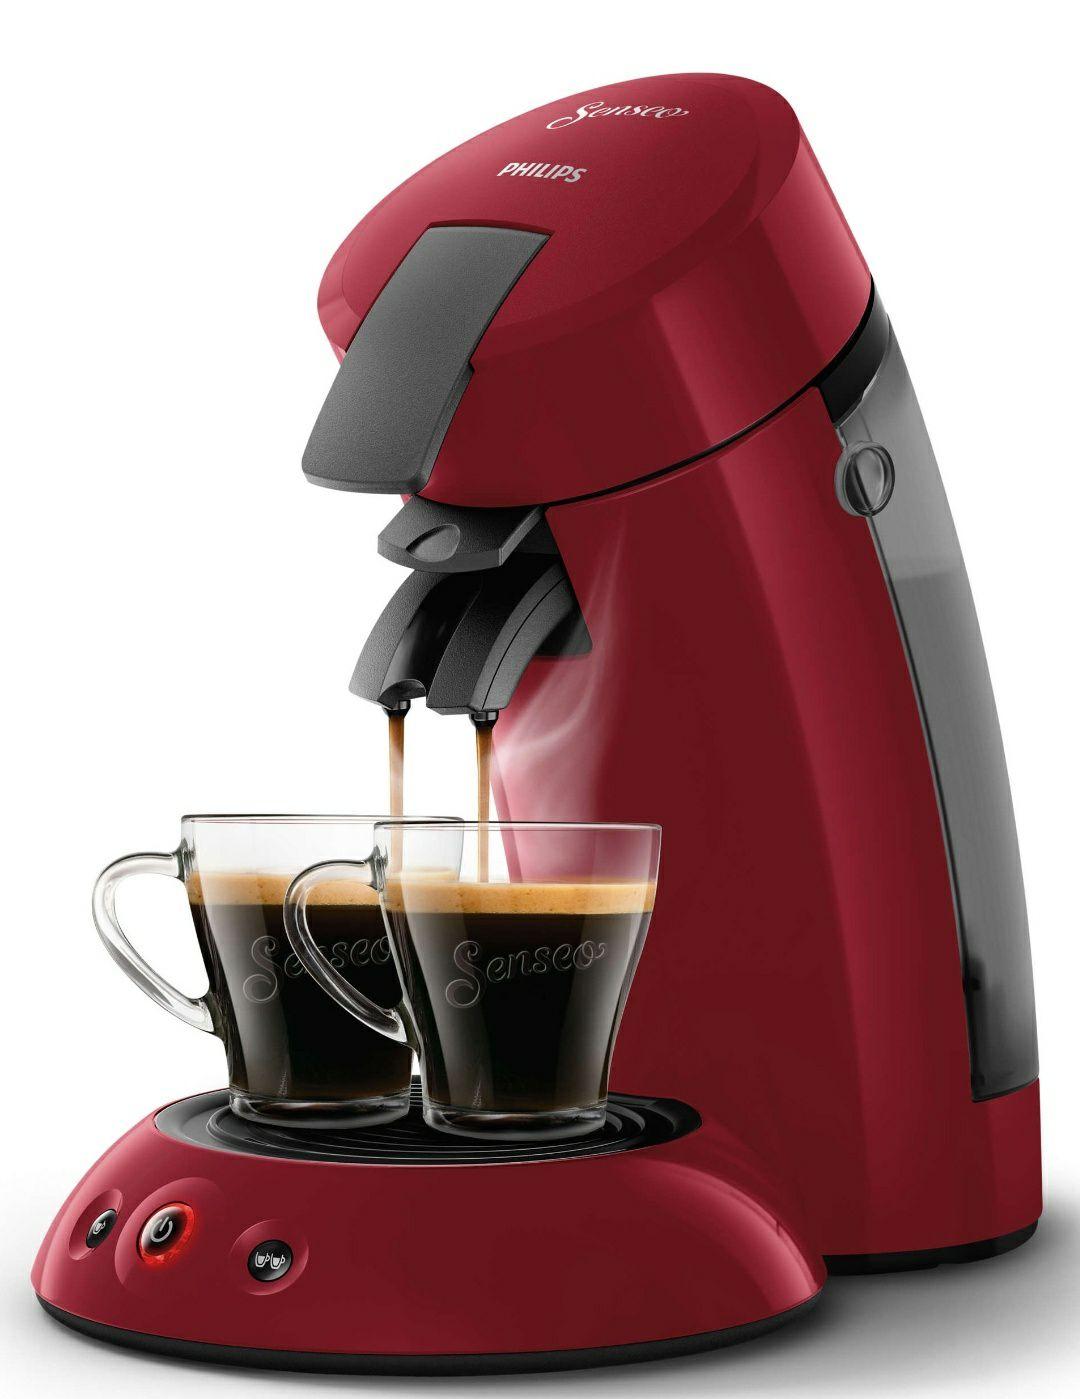 Philips Senseo Kaffeepadmaschine Original HD6553 HD6553/80 (rot)